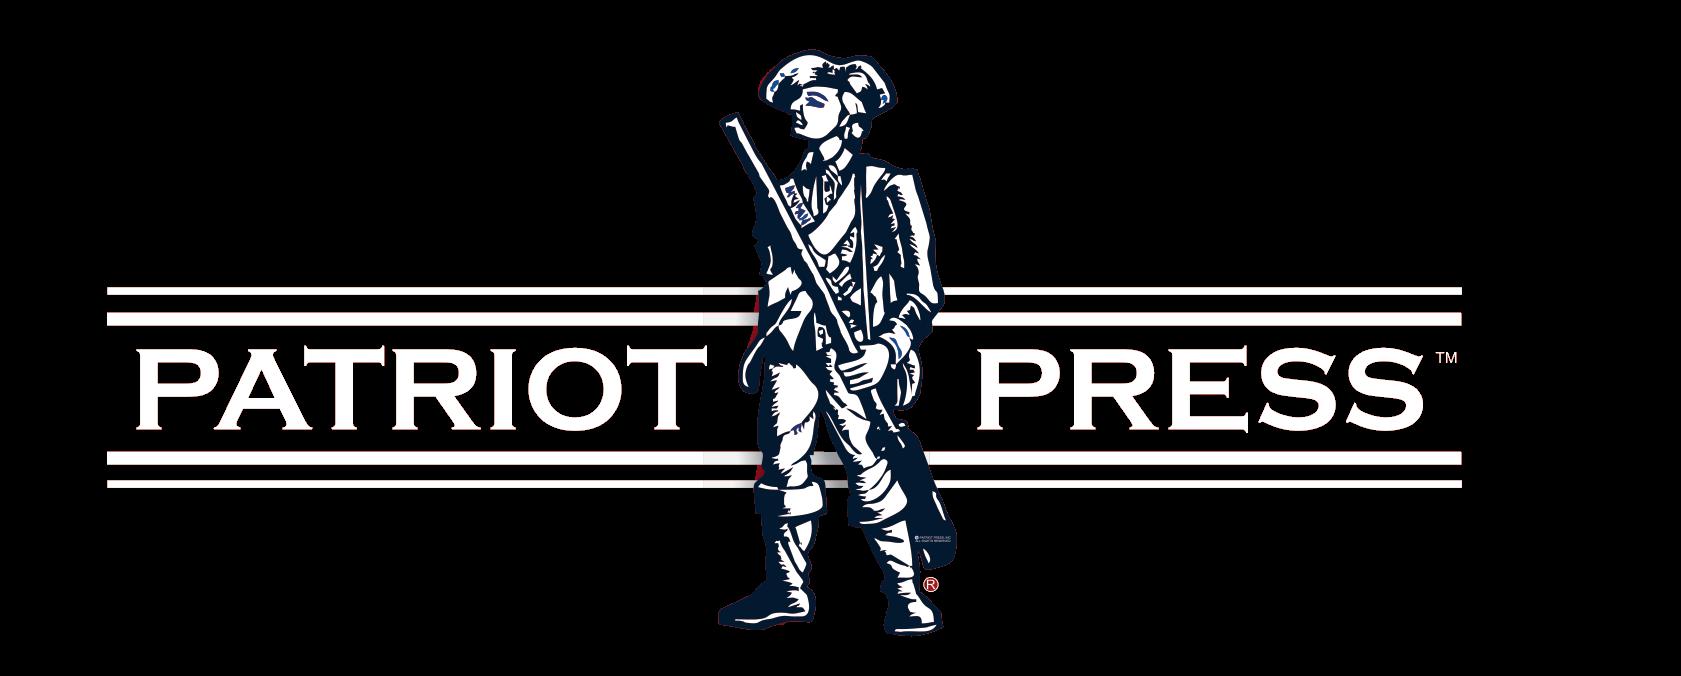 Patriot Press